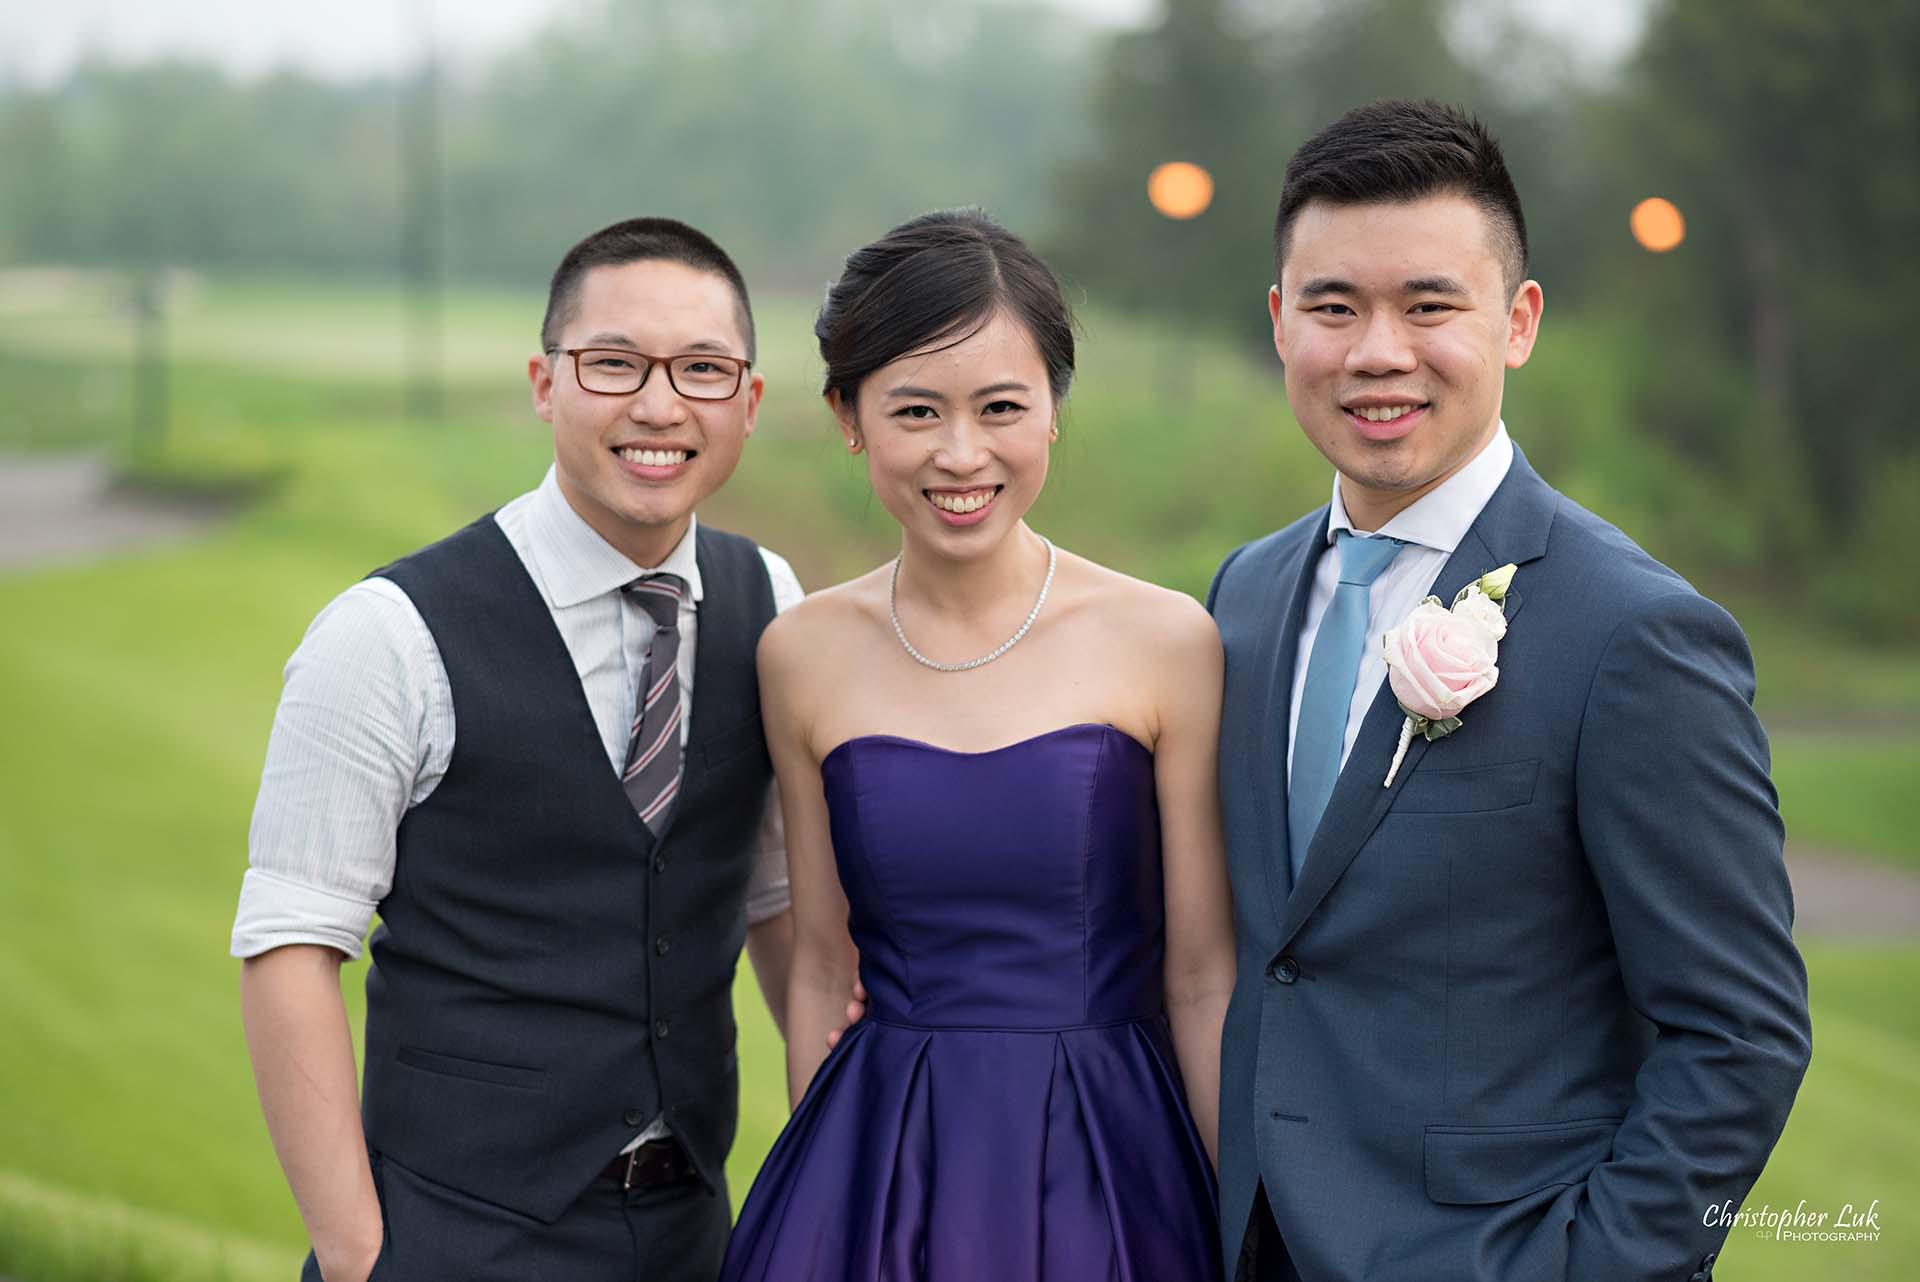 Christopher Luk Toronto Wedding Photographer Noel Nathaniel Bride Groom Together